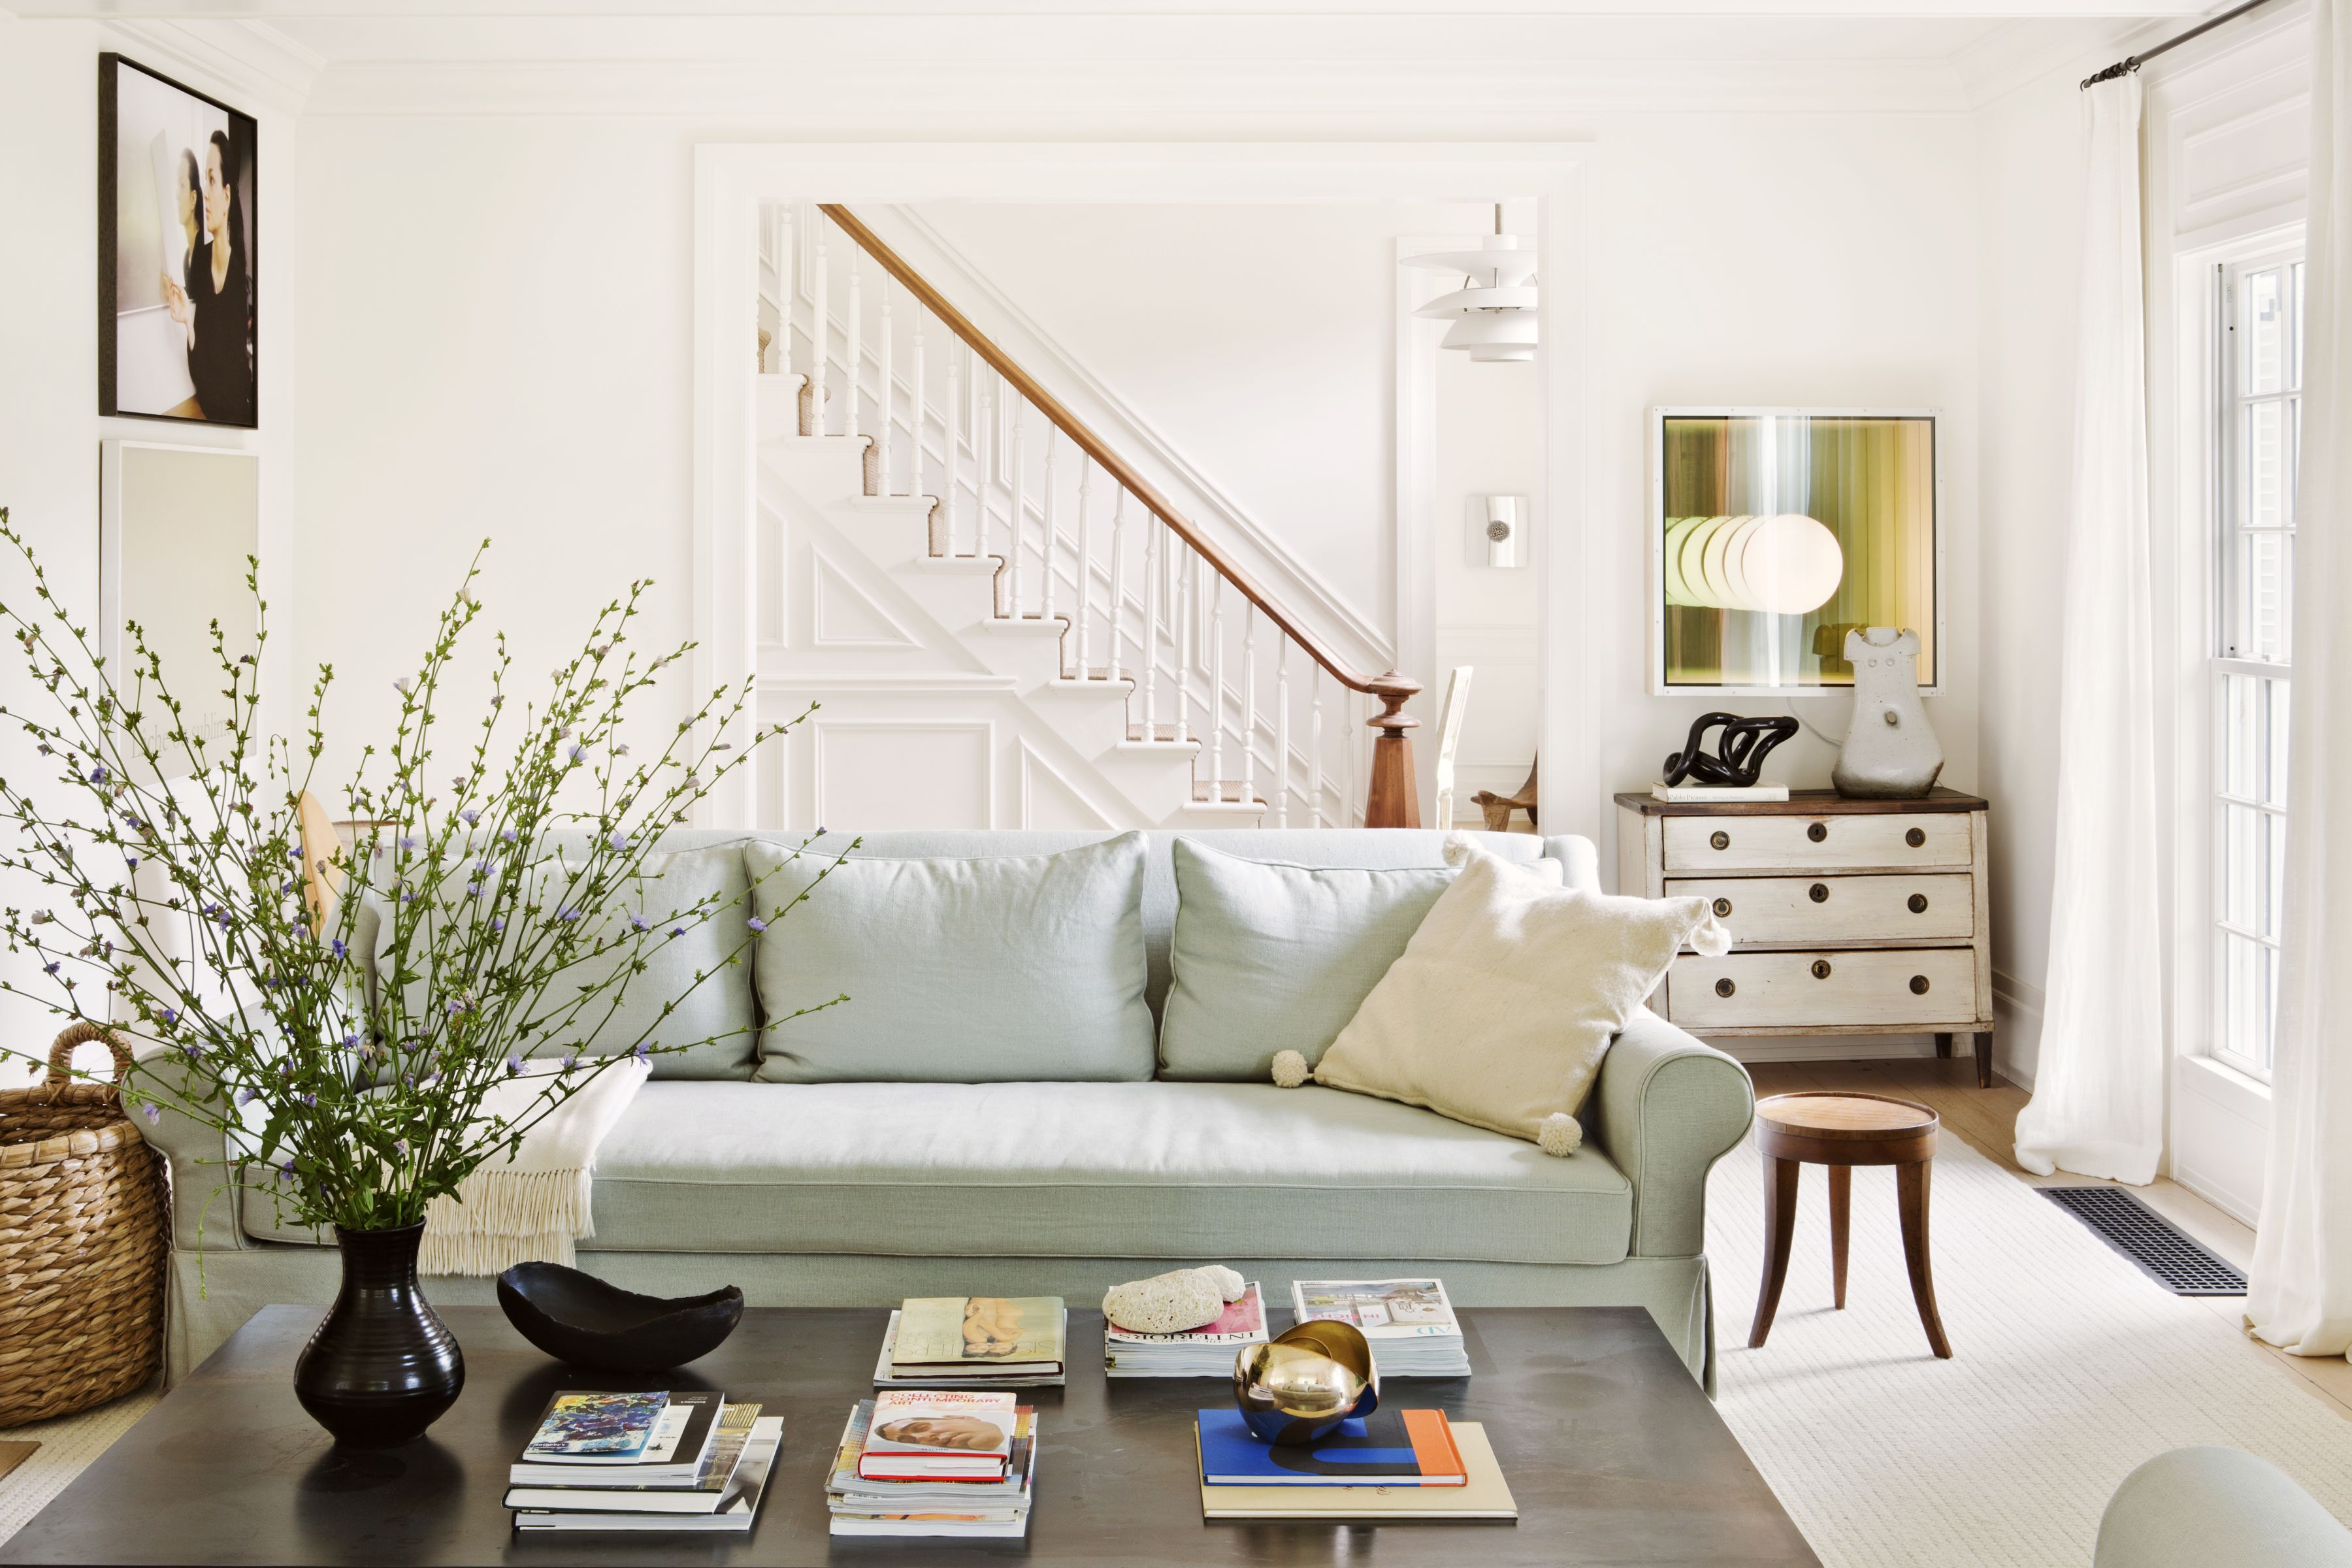 618 living room